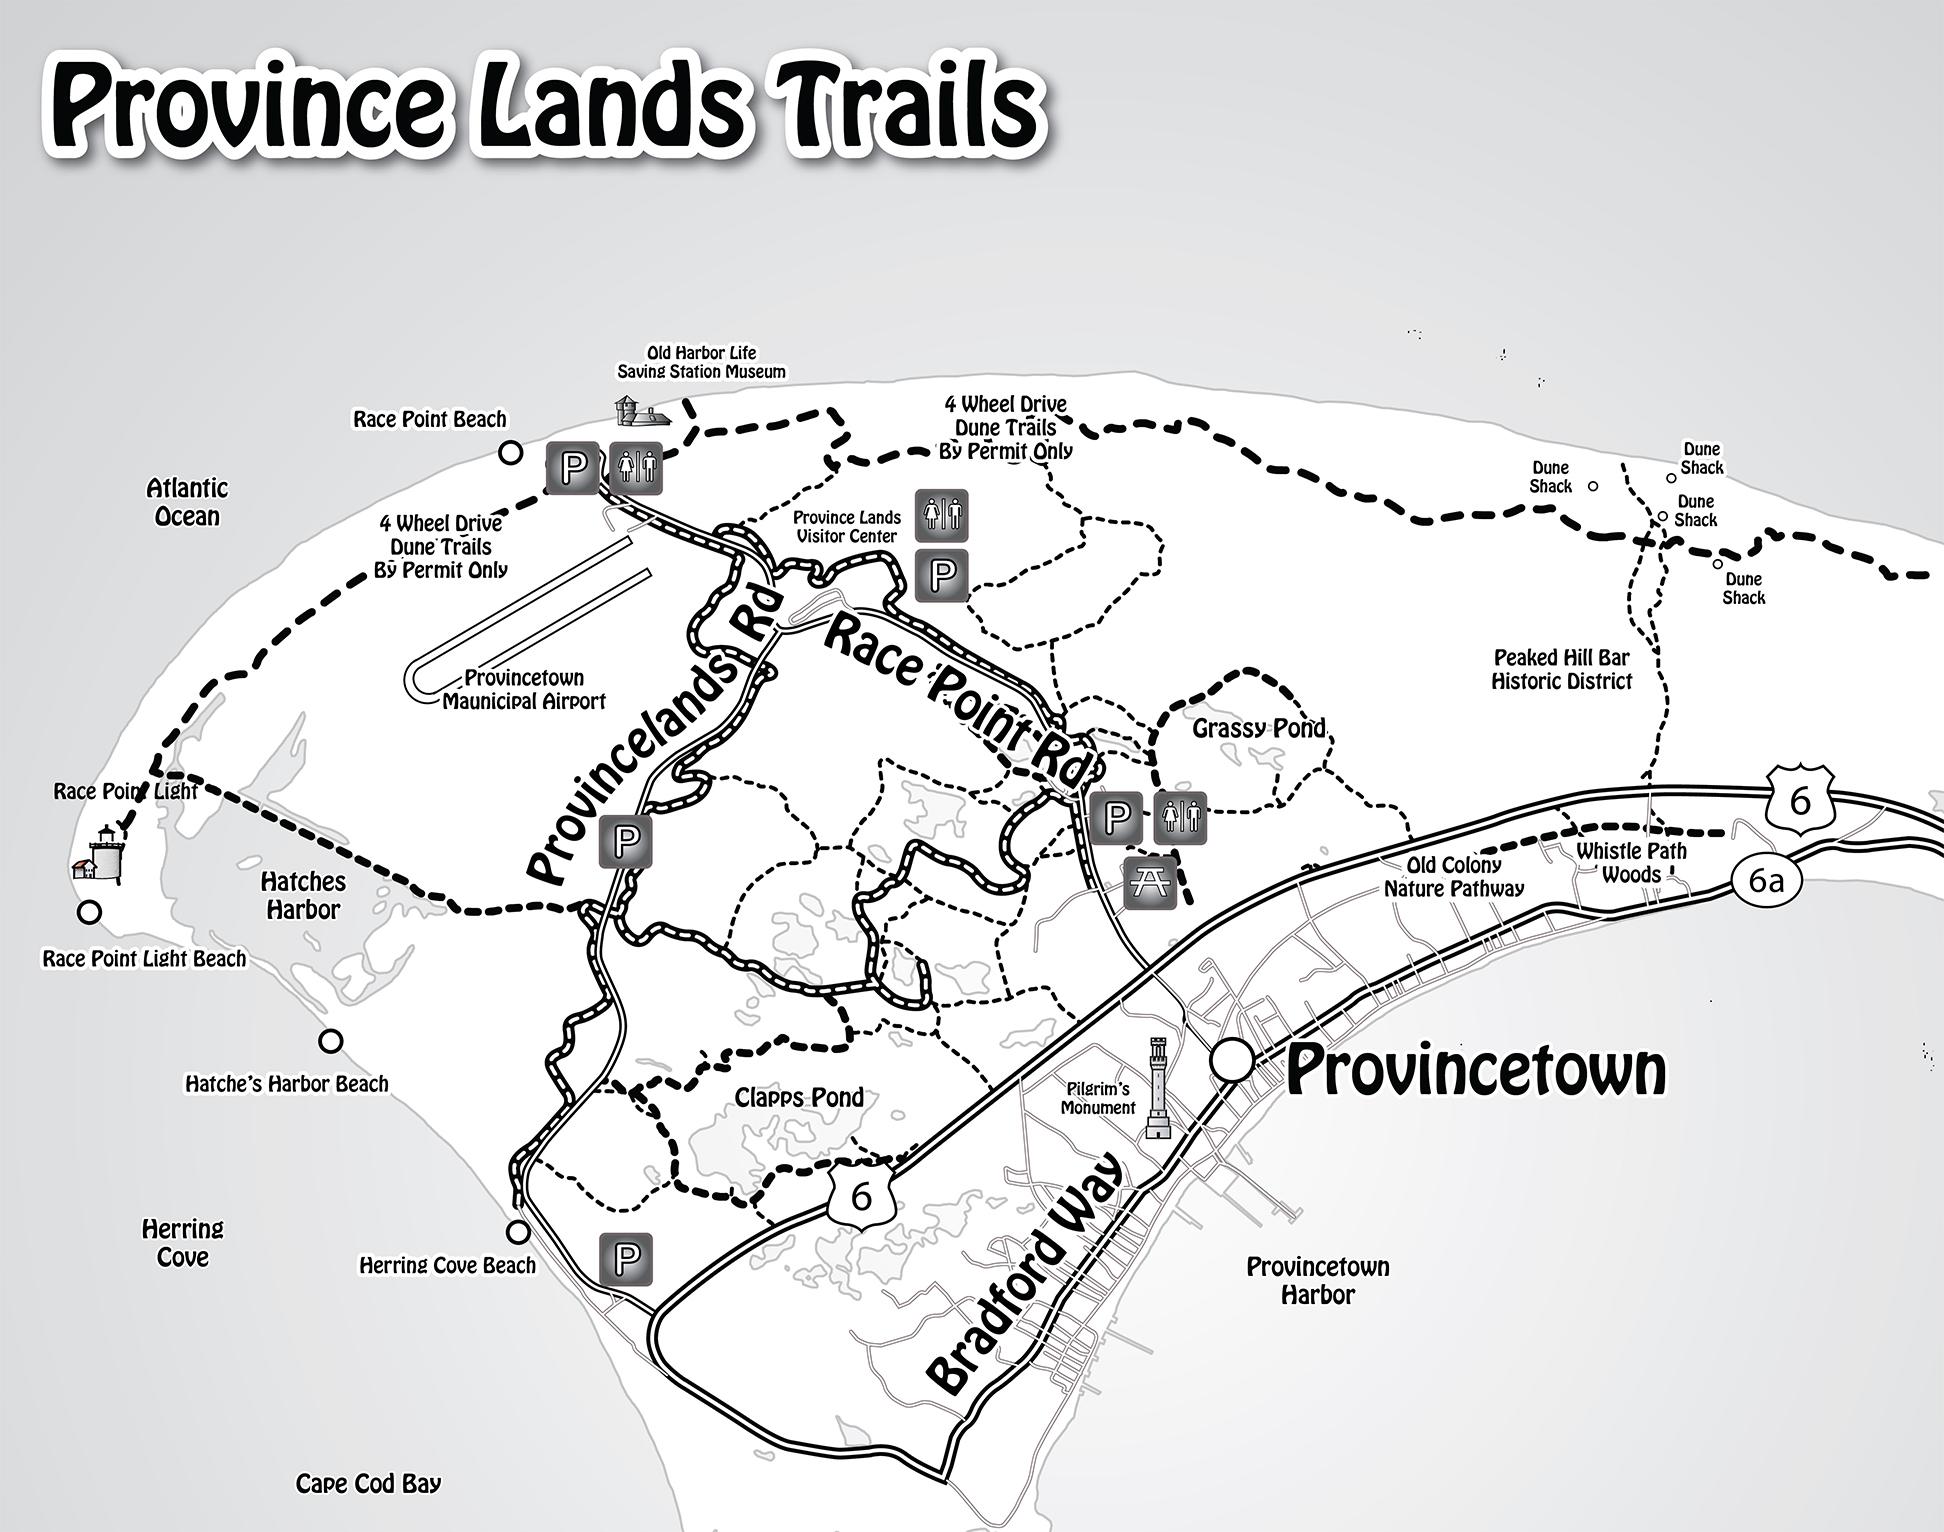 YouHike_CapeCod__Provinceland_Map_JPEG_BW